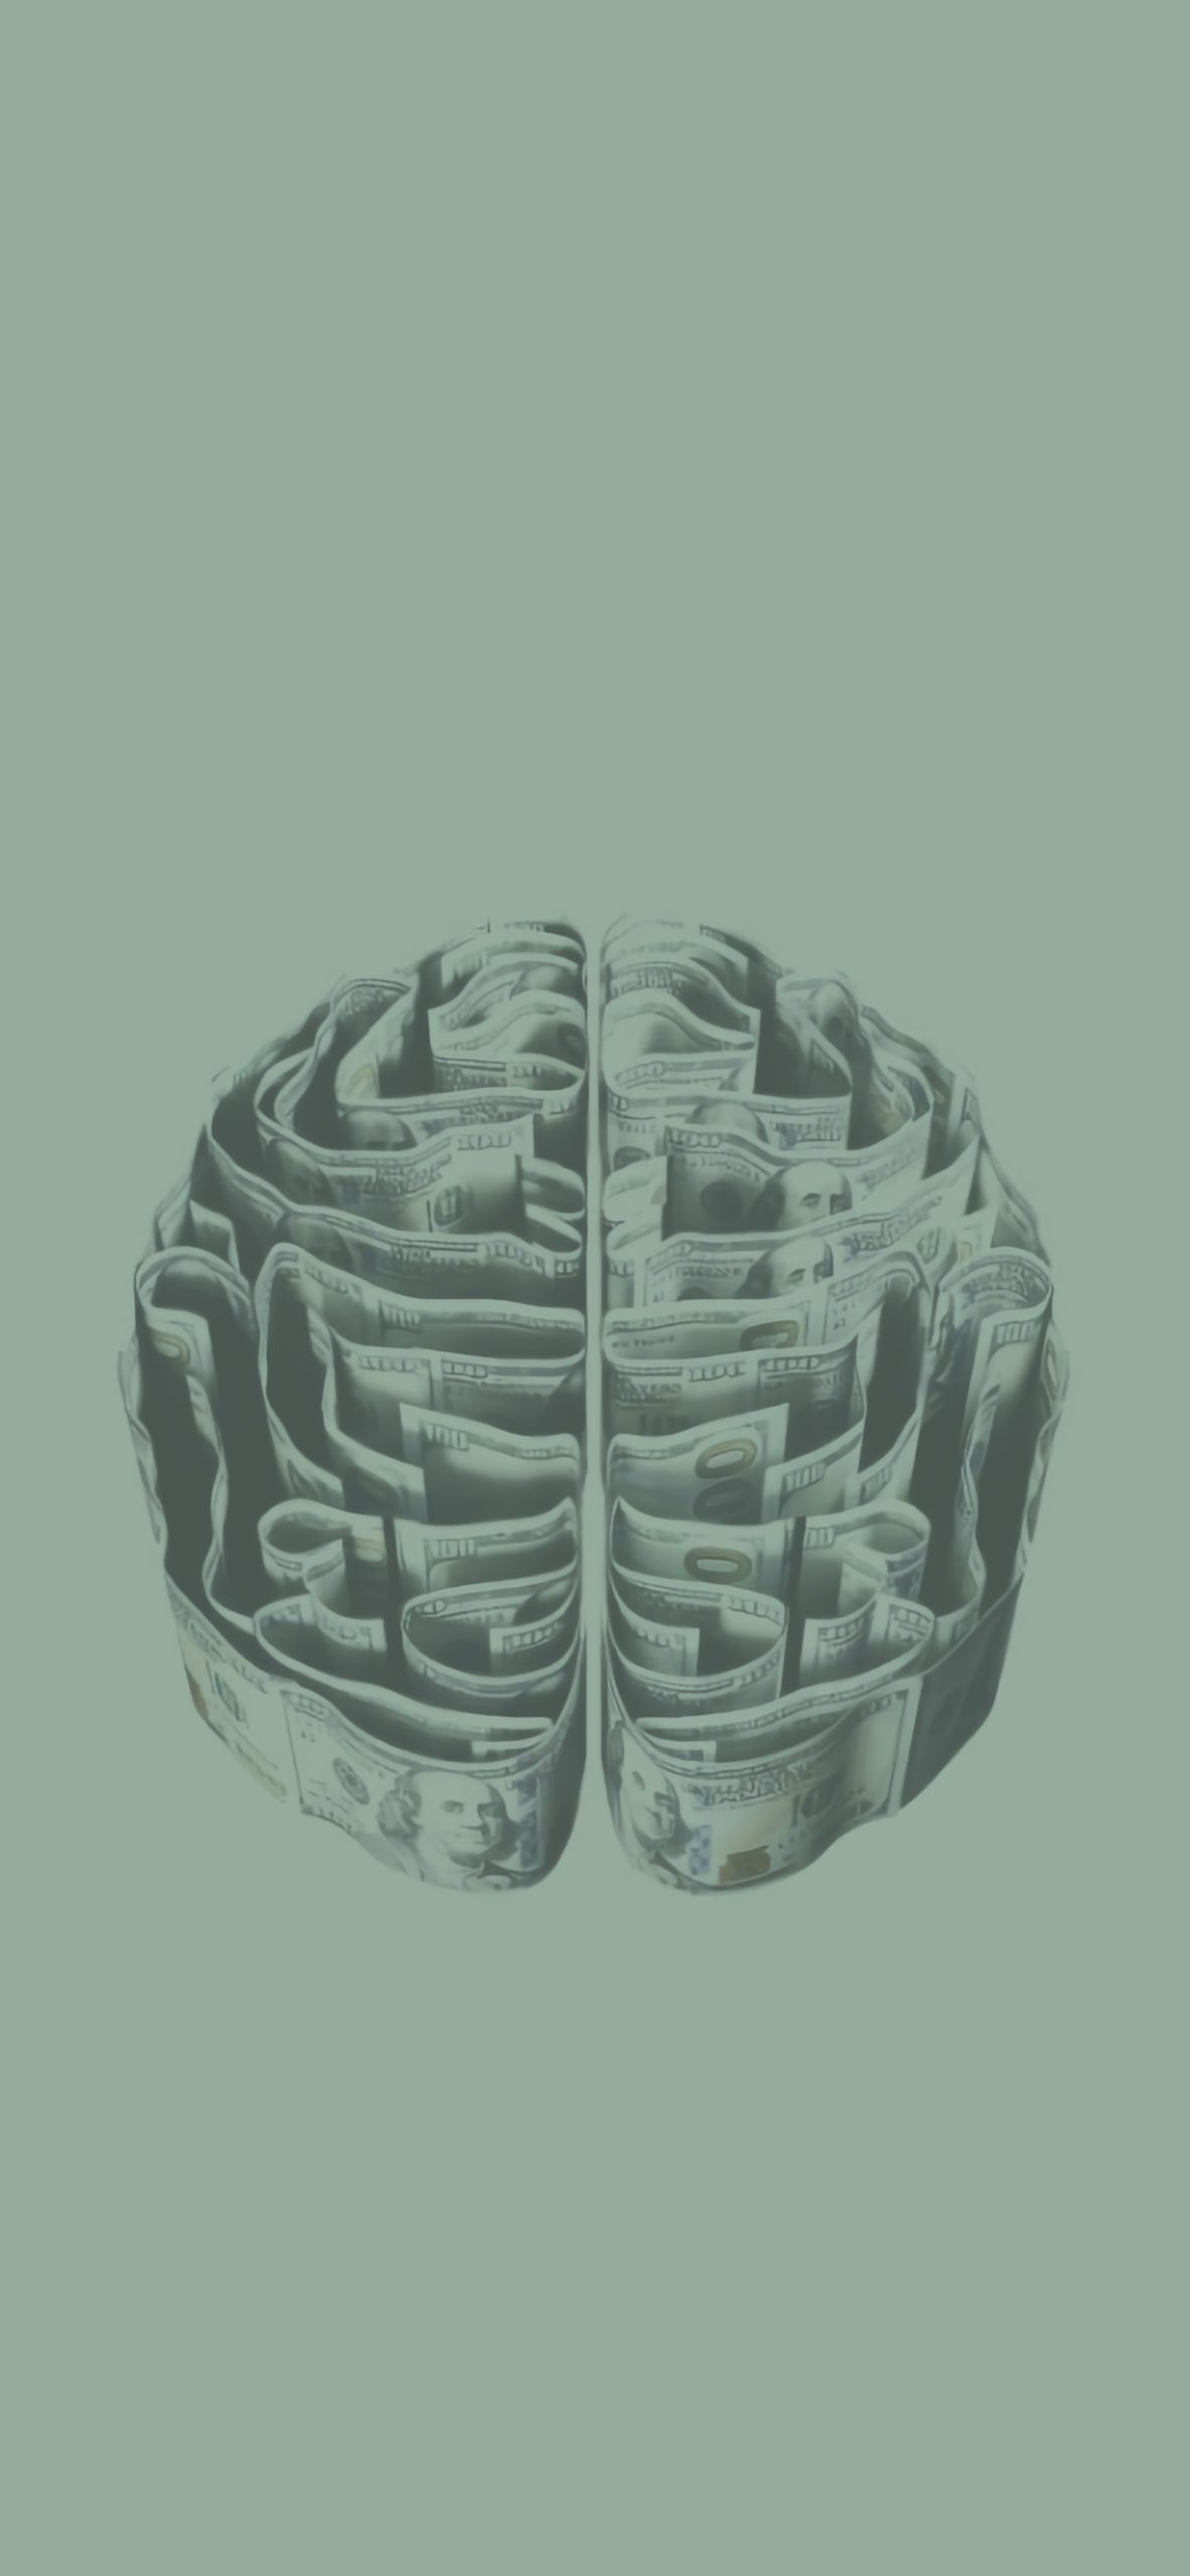 Advanced Neurology Care Article Image